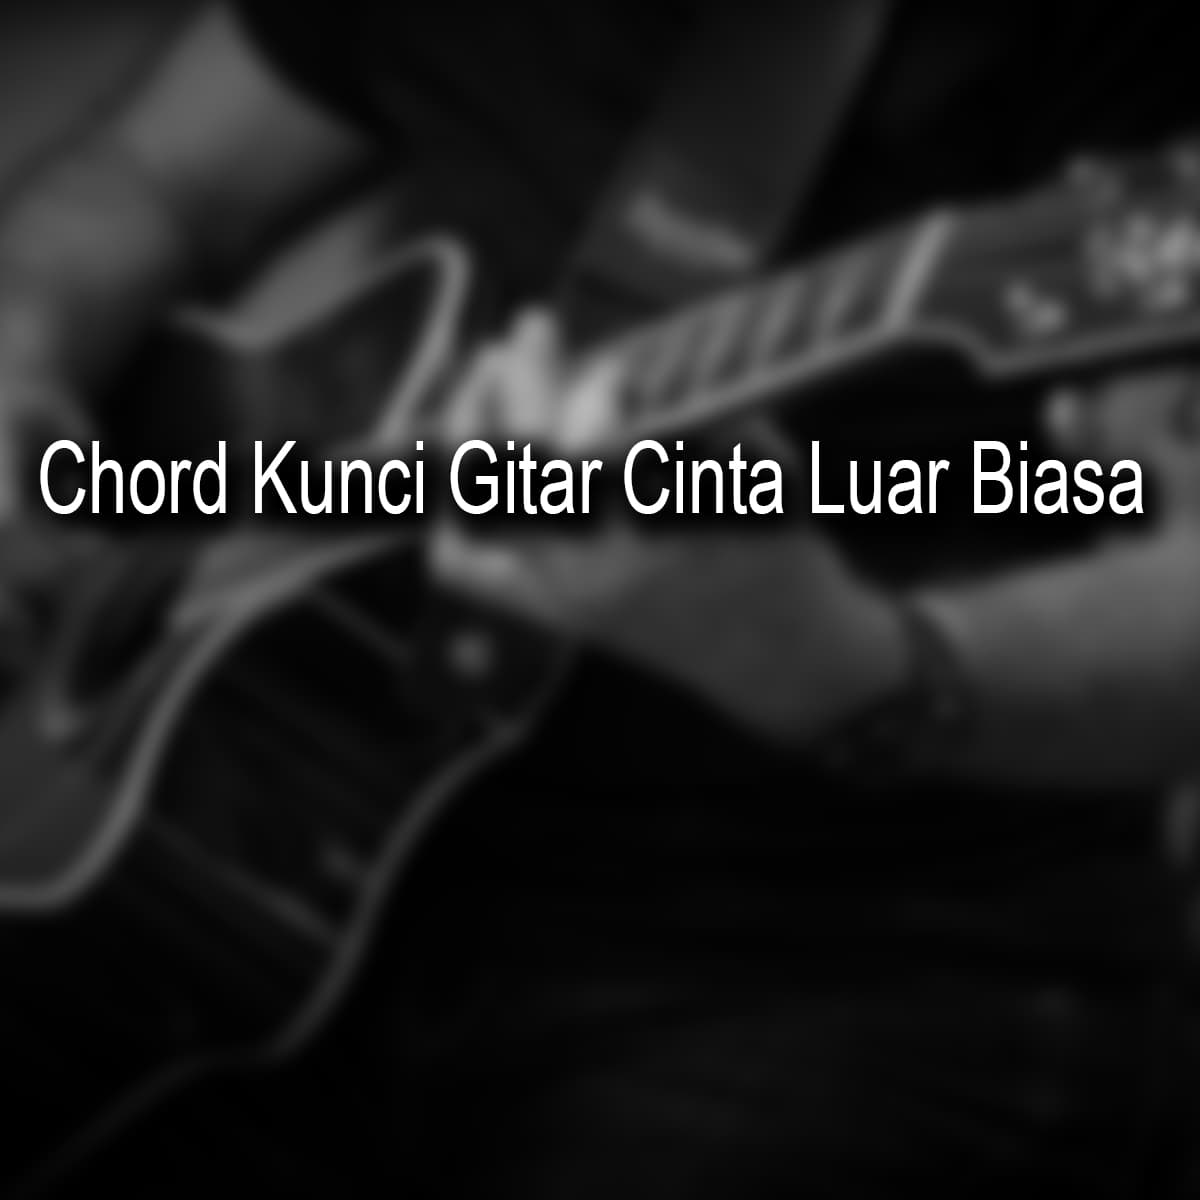 Chord Kunci Gitar Cinta Luar Biasa - Andmesh Kamaleng